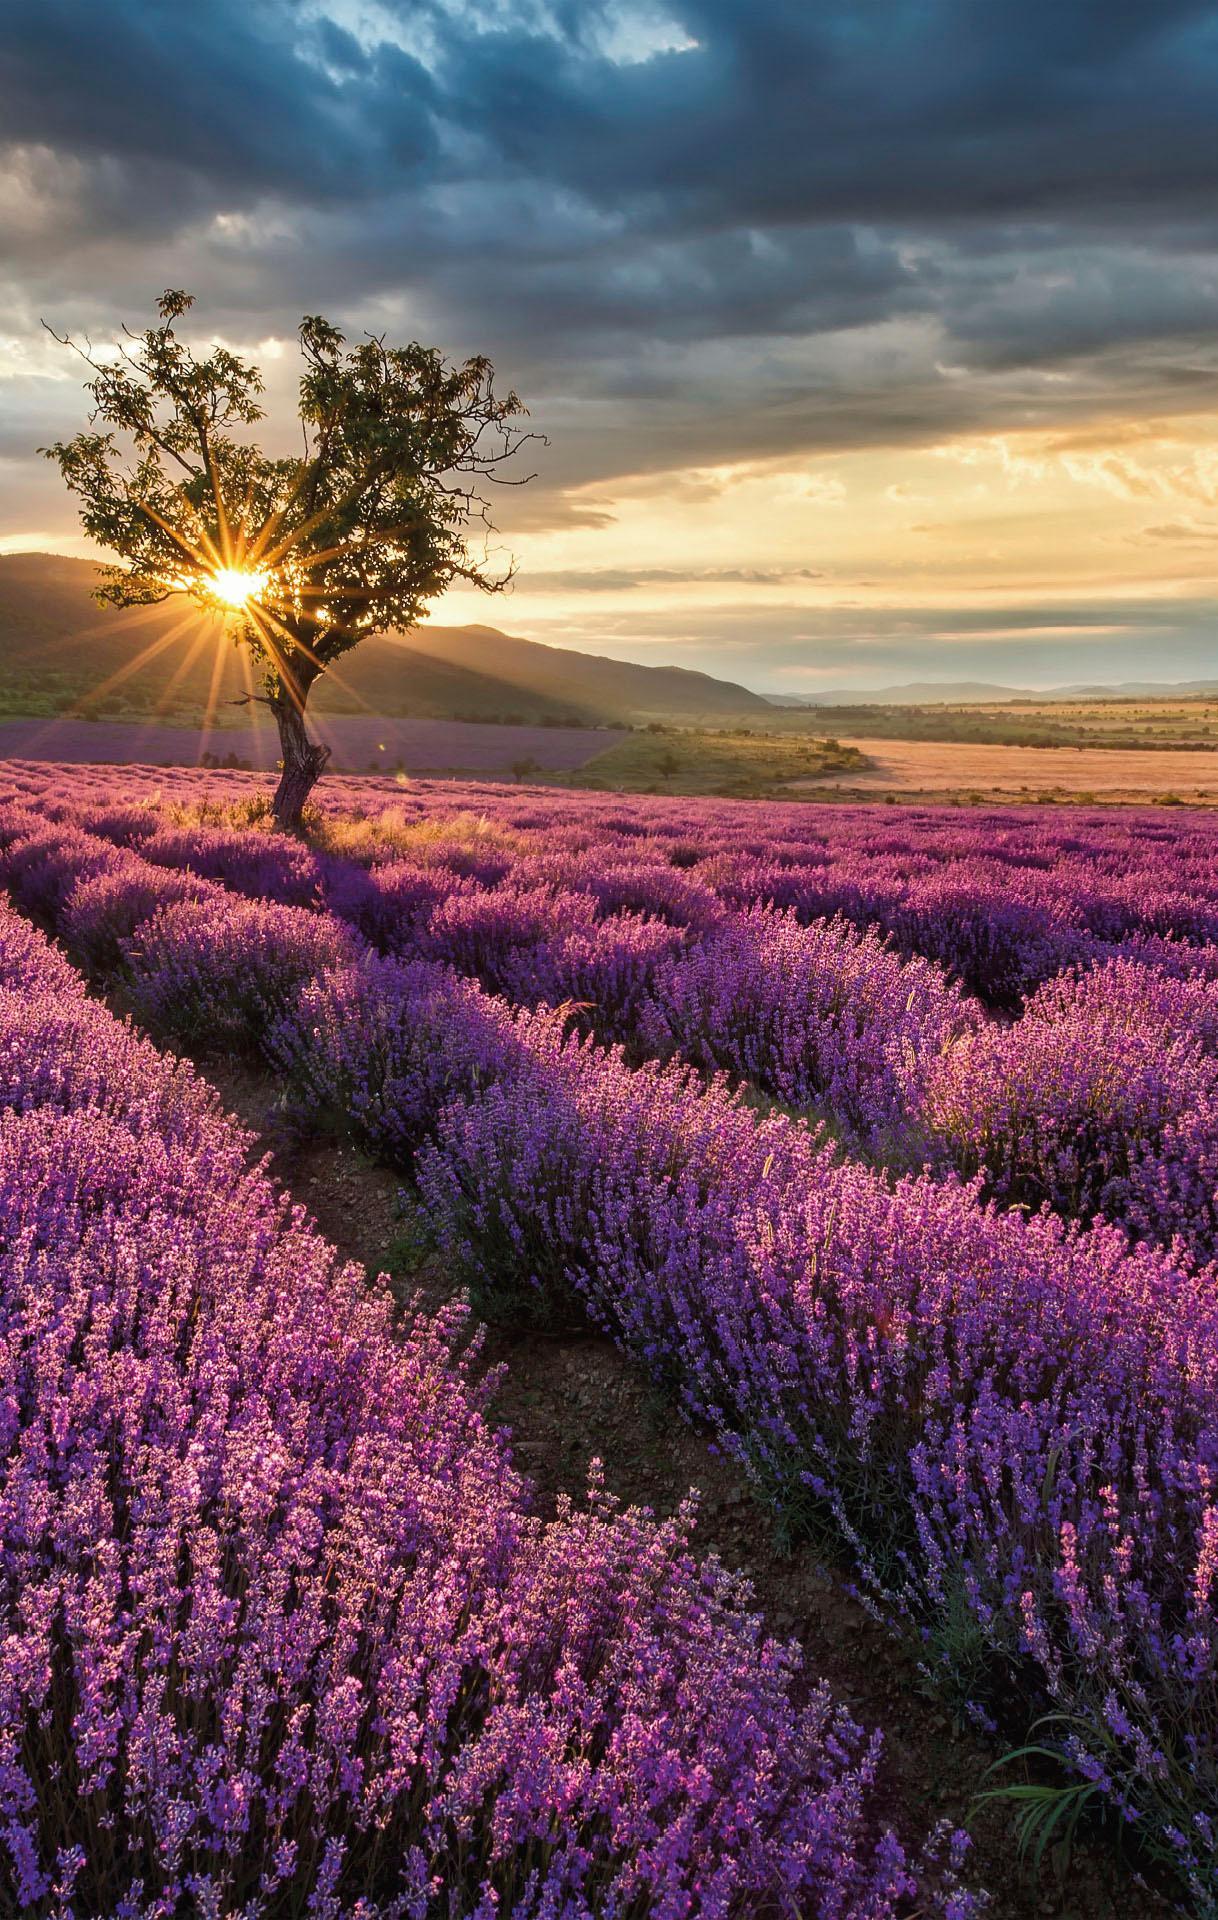 Vliestapete Lavendelblüte in der Provence bunt Fototapeten Tapeten Bauen Renovieren